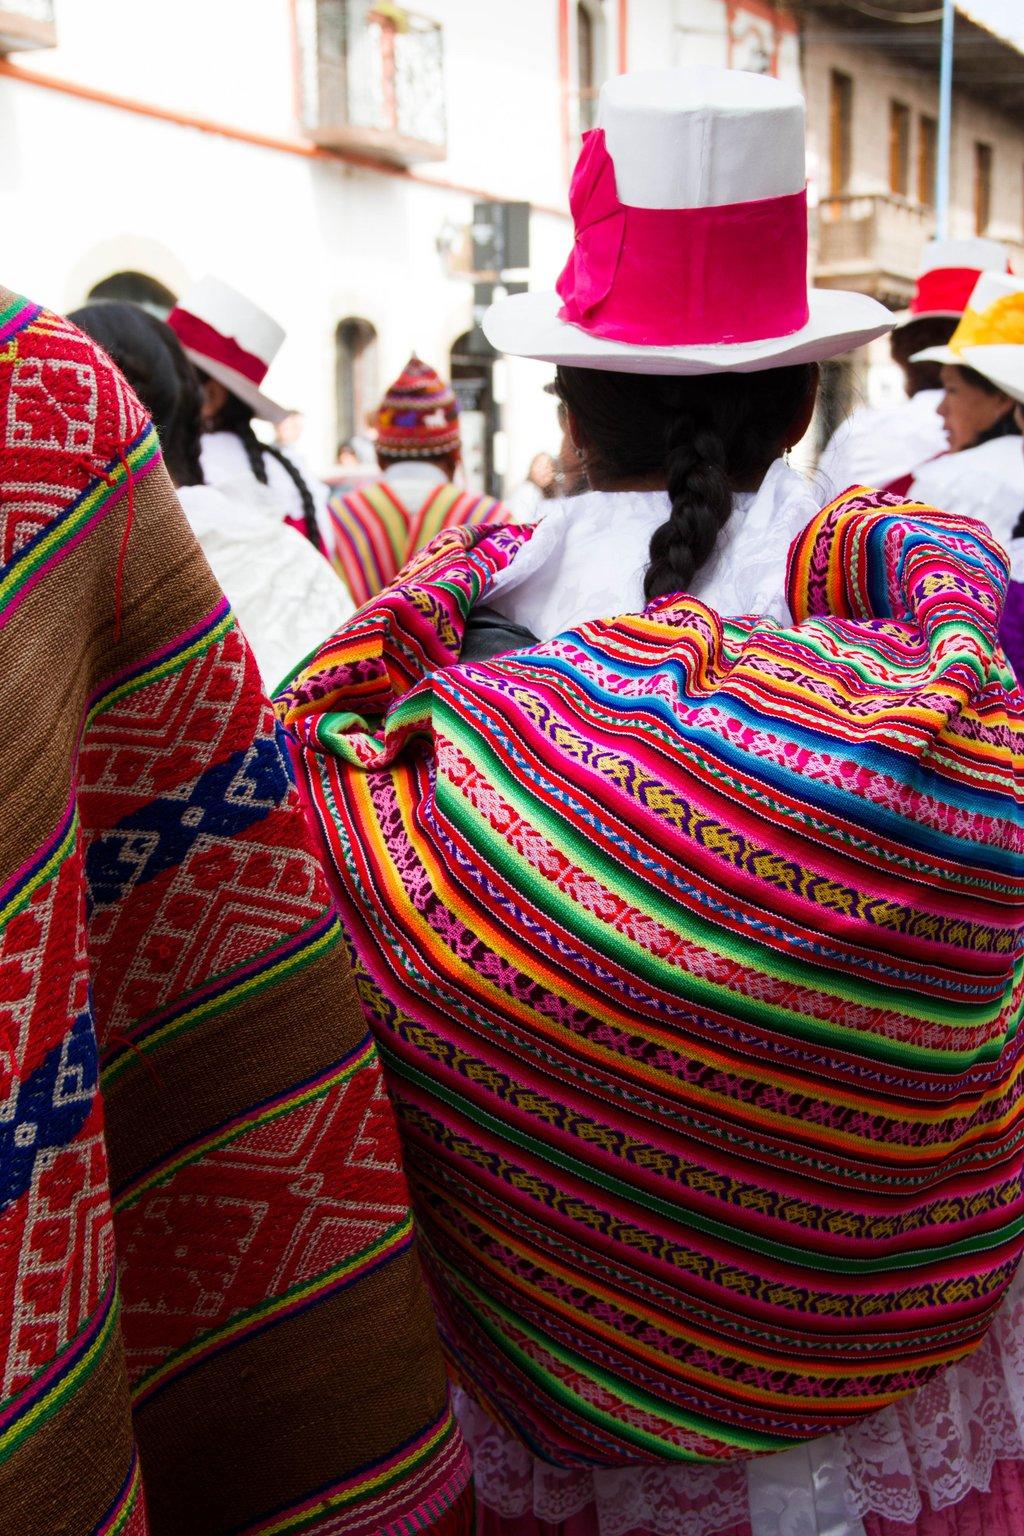 La-Manta-Cusco-Photo-Dottydot.jpg?1543144591